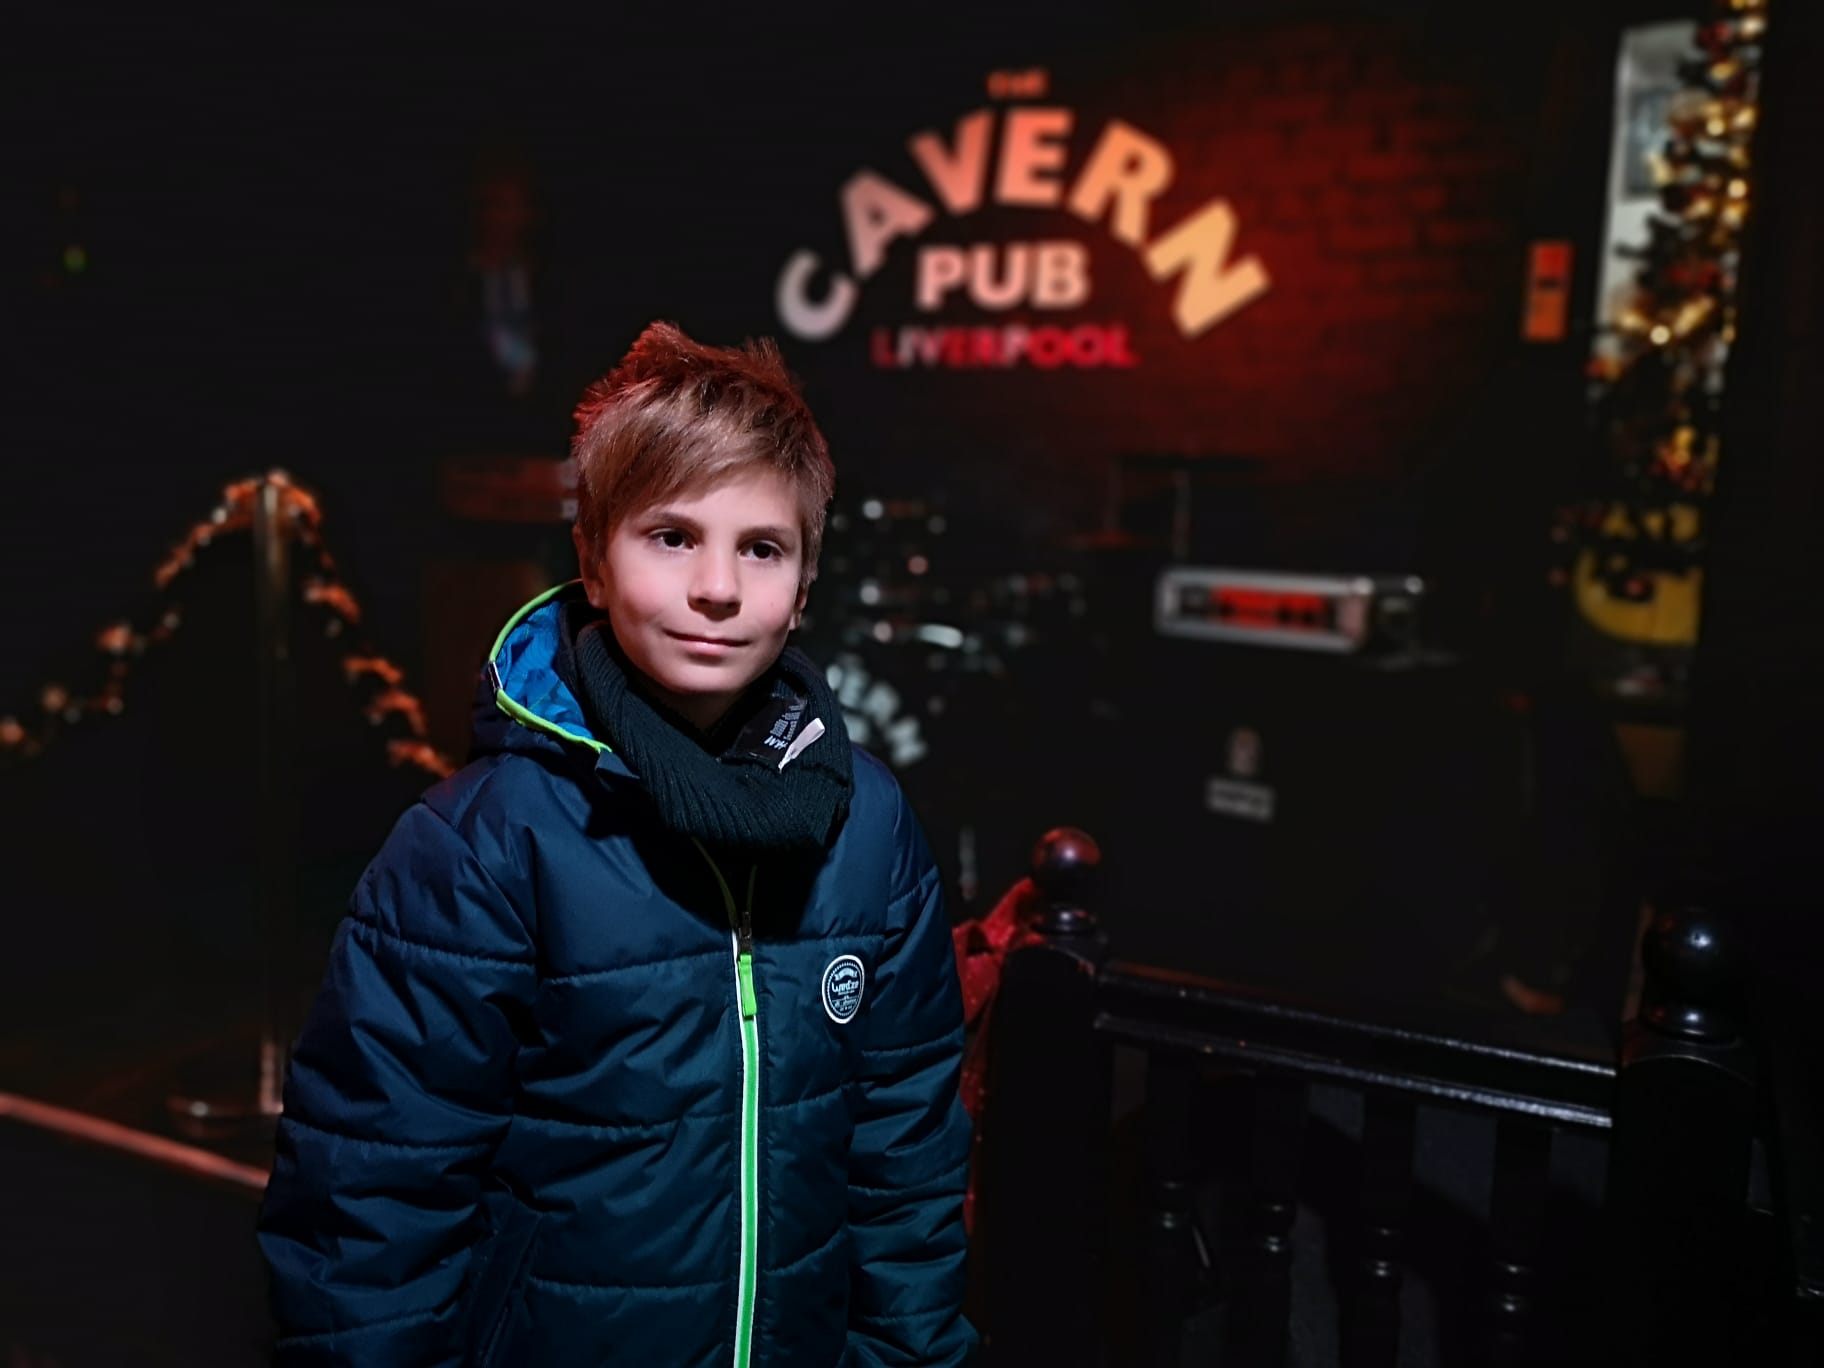 niño - cavern club - pub - liverpool